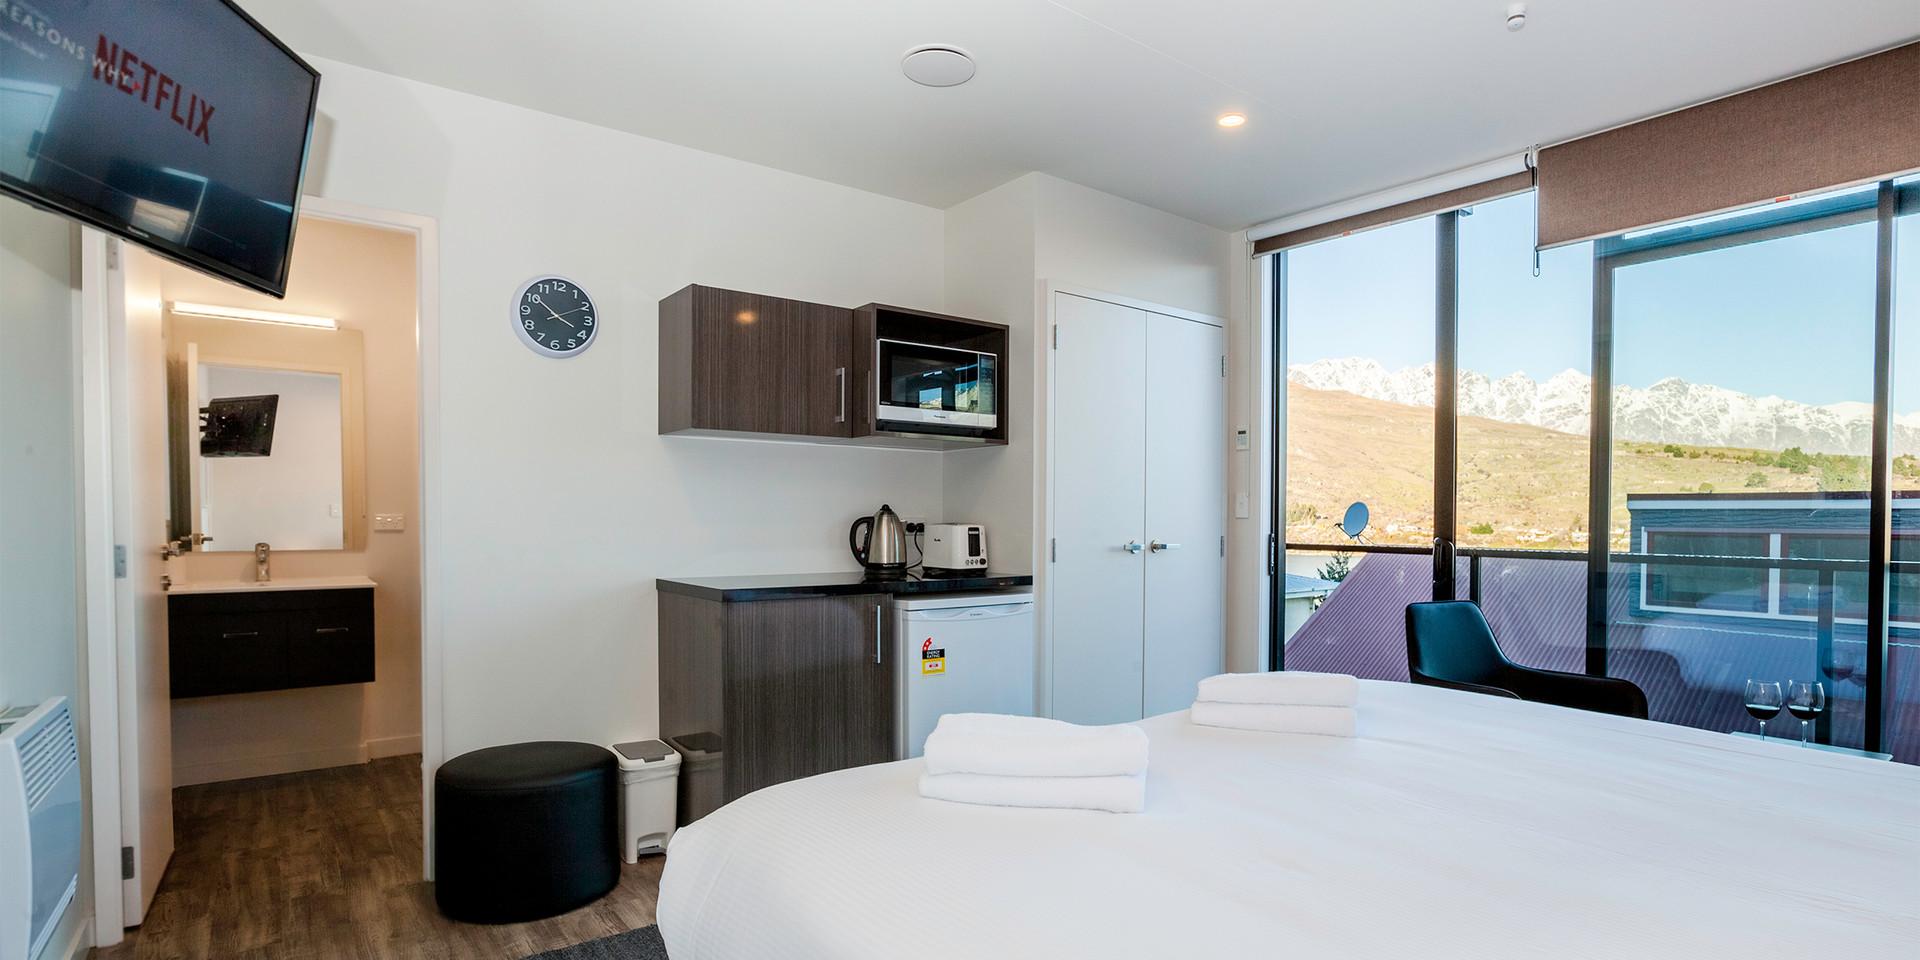 Interior bedroom, kitchenette